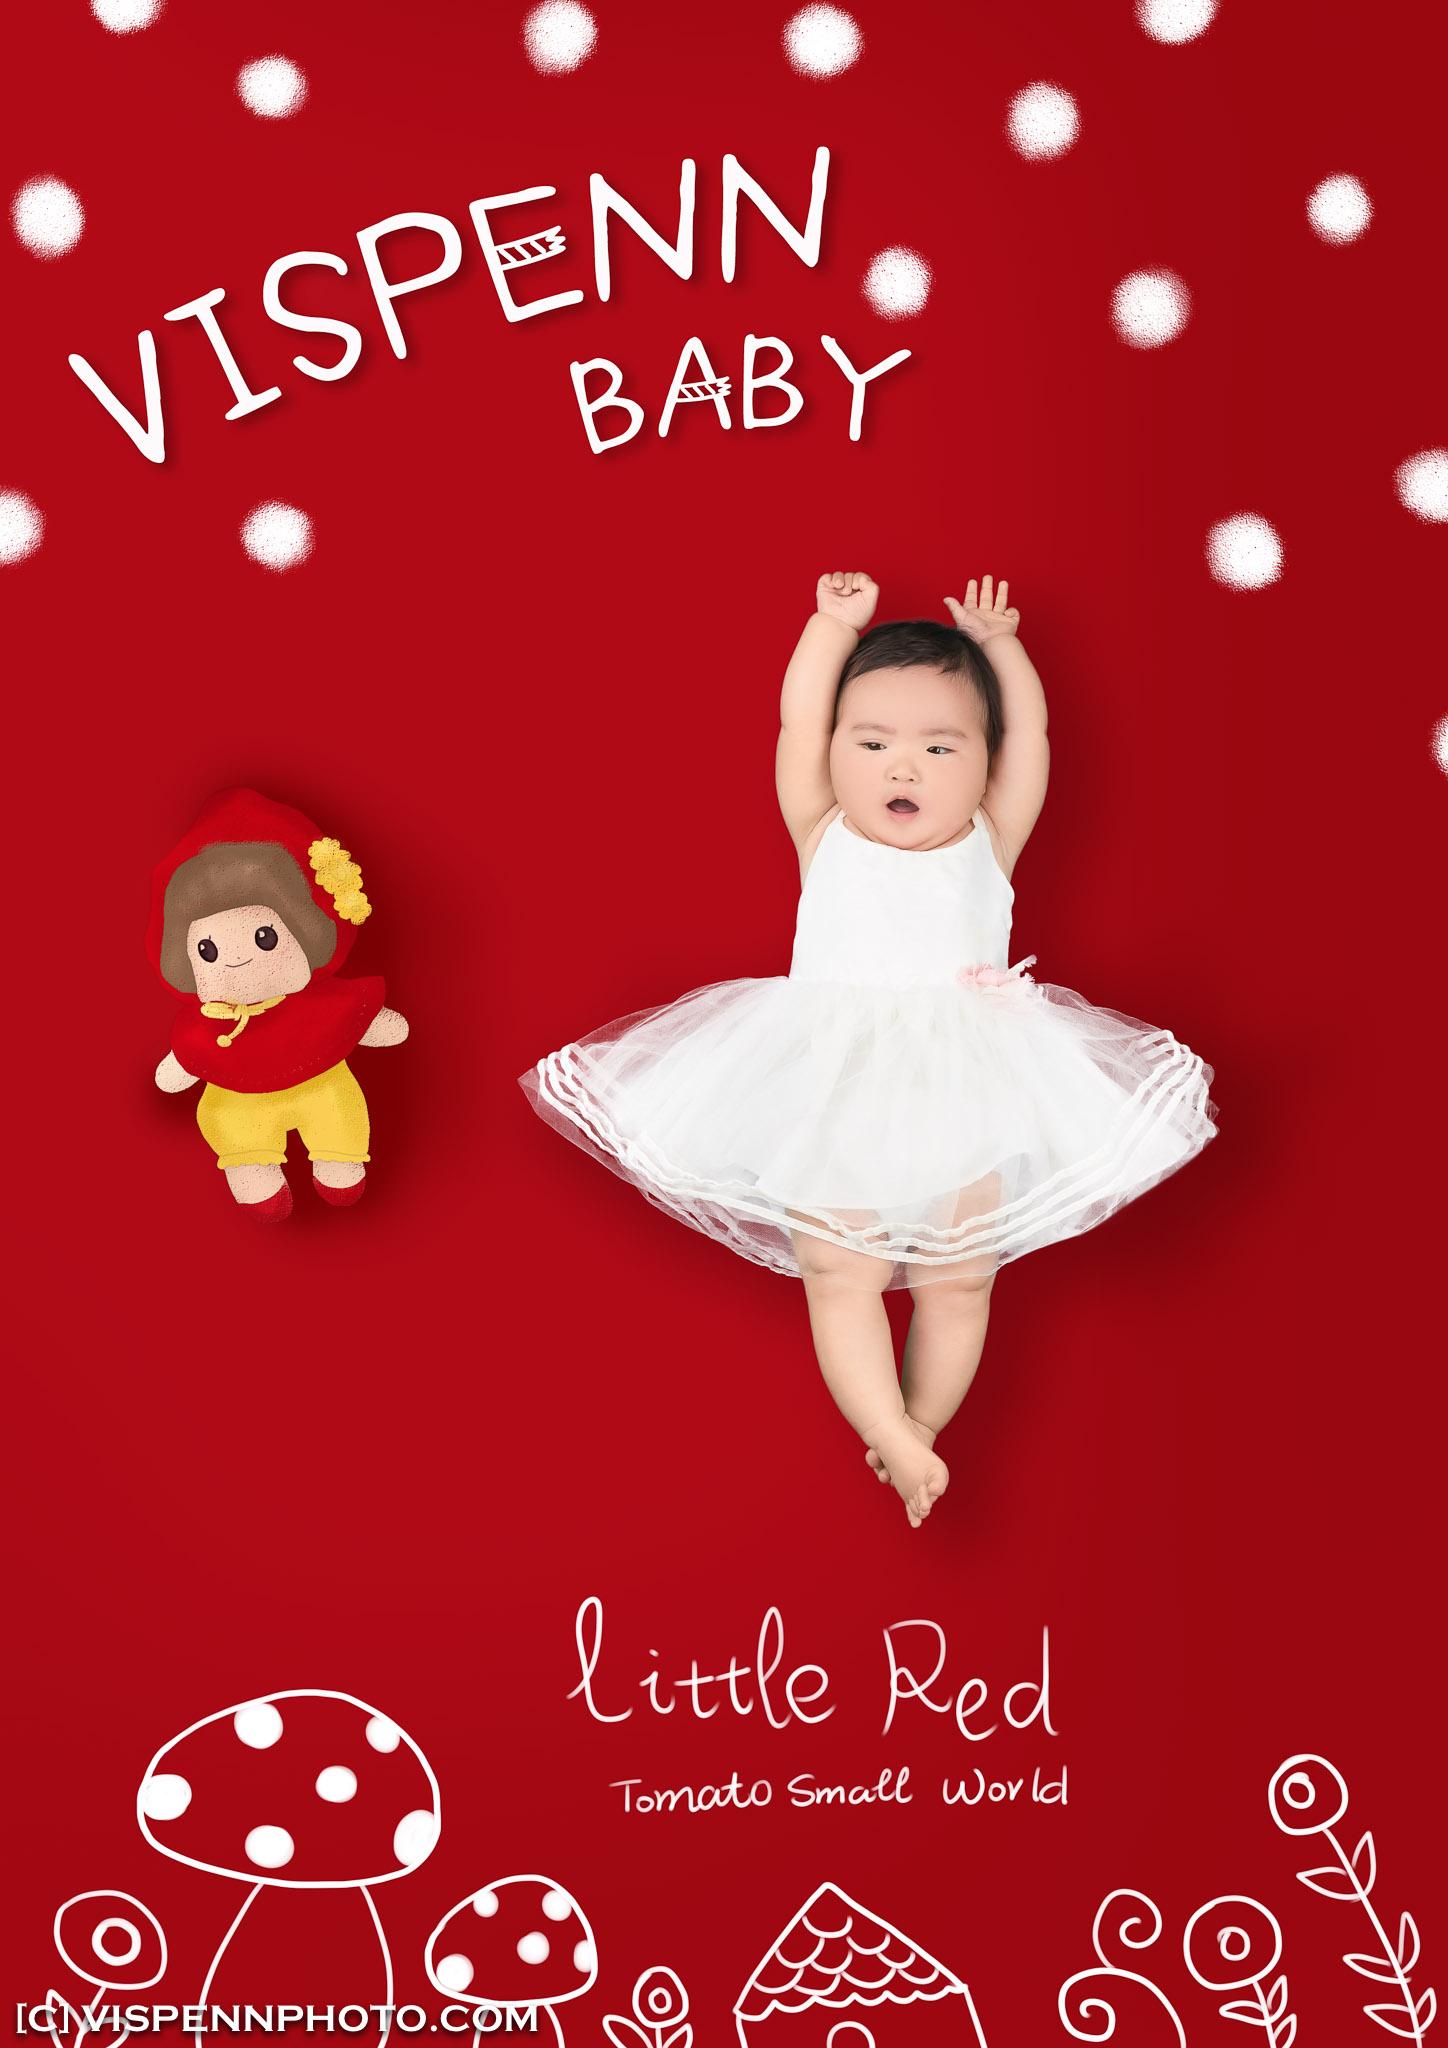 Melbourne Newborn Baby Family Photo BaoBao VISPENN 墨尔本 儿童 宝宝 百天照 满月照 孕妇照 全家福 100DAYS VISPENN BethHuang 2206